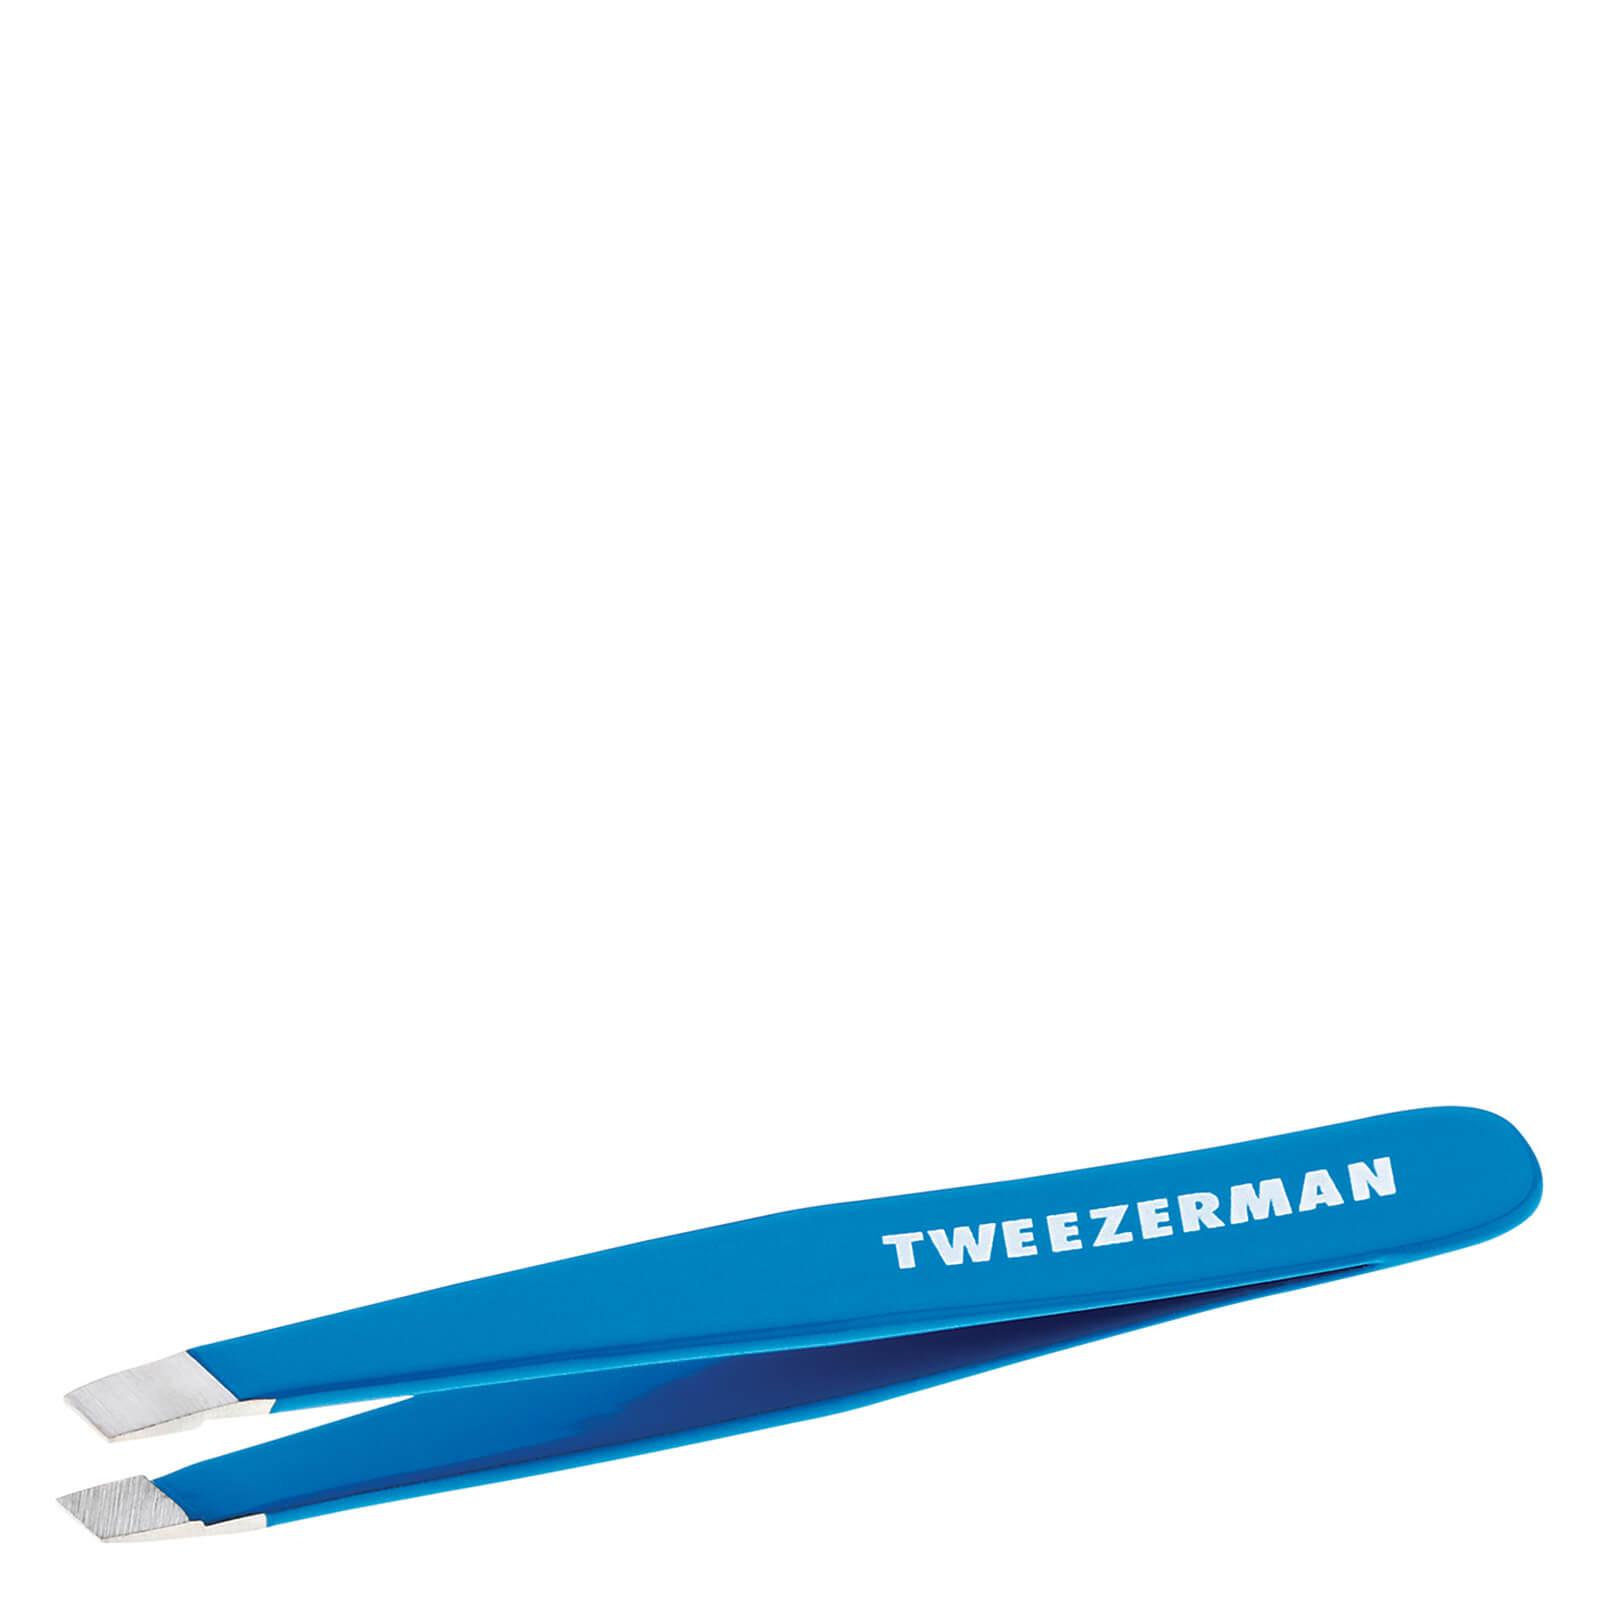 Tweezerman Mini Slant Tweezer - Blue Bahama